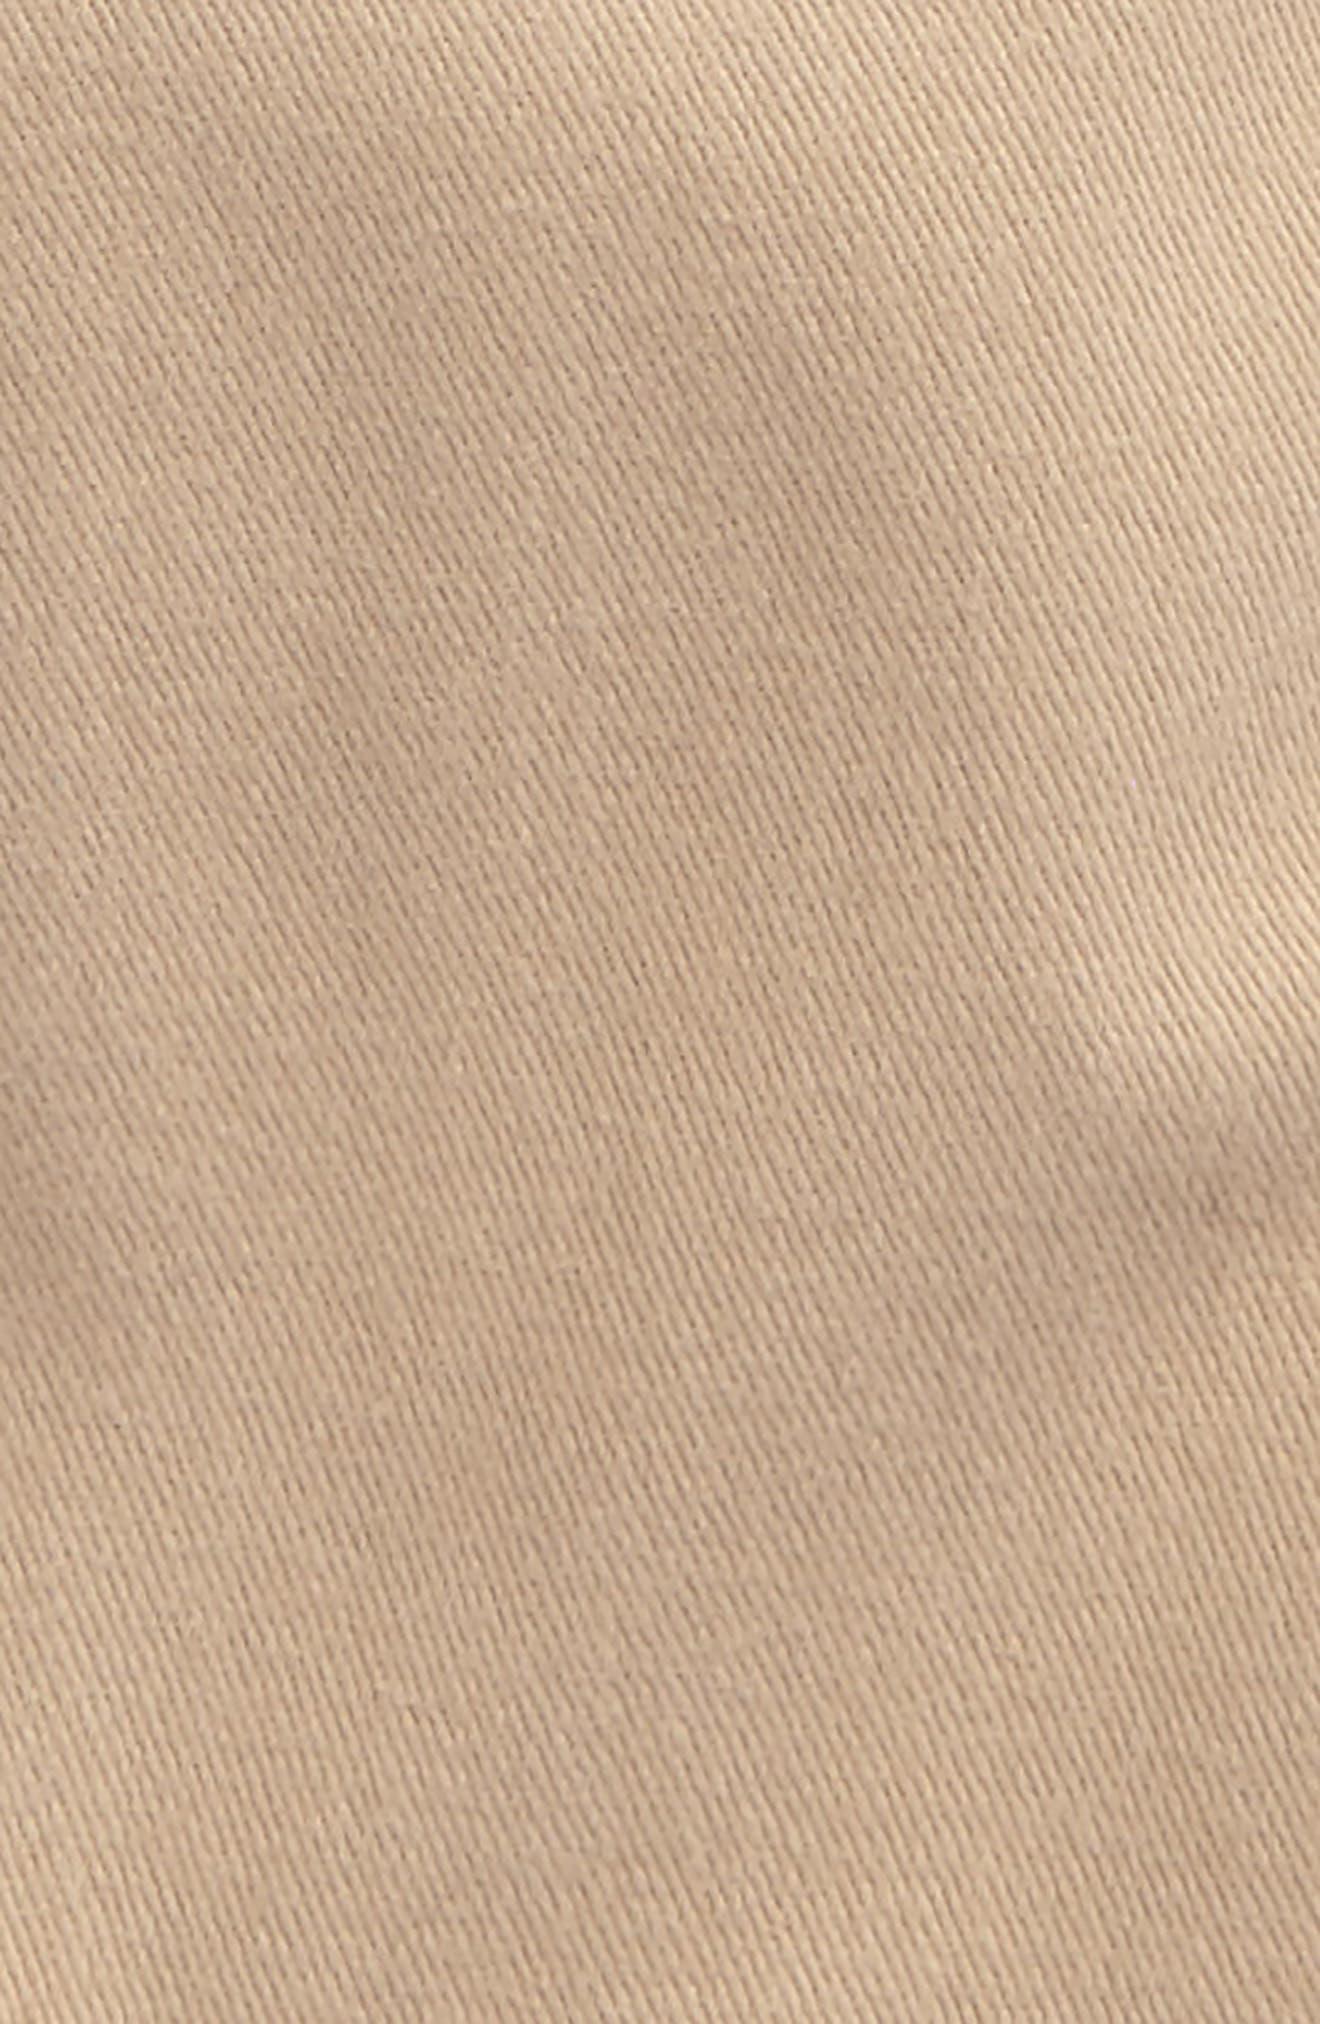 Stretch Cotton Twill Pants,                             Alternate thumbnail 2, color,                             Beige/ Khaki